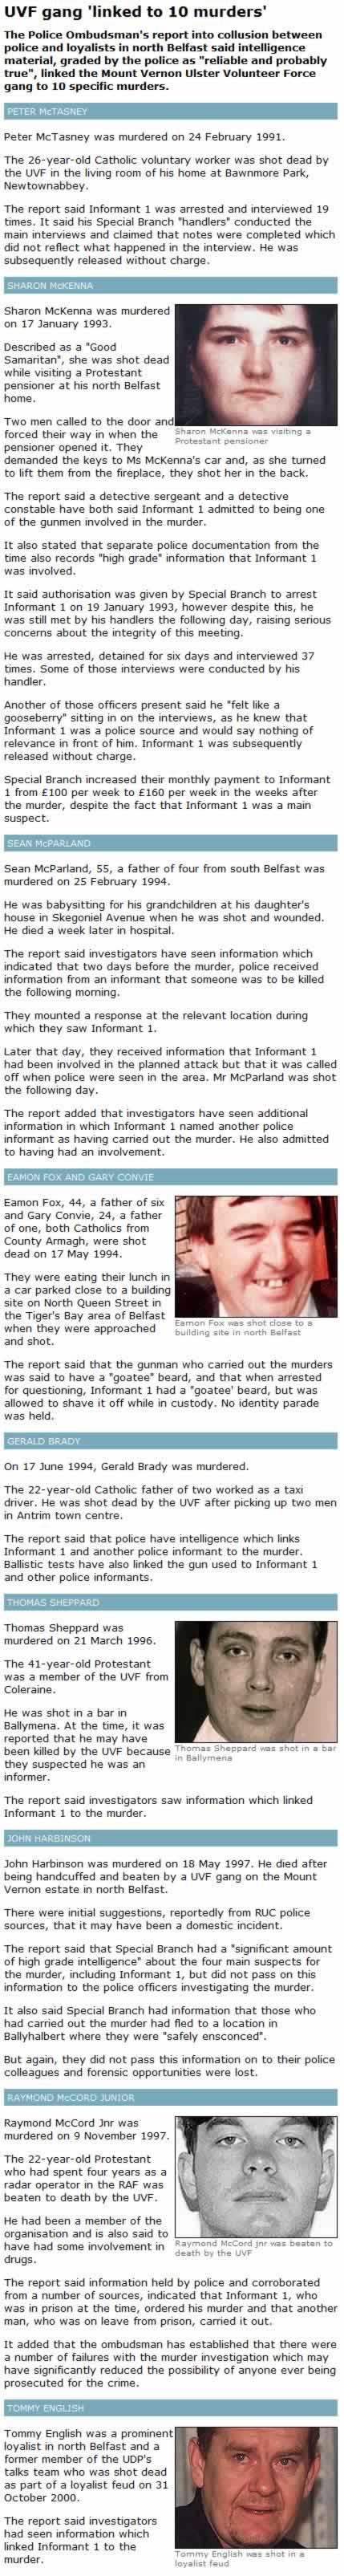 RUC/PSNI covered their agents Loyalist terrorist murderers